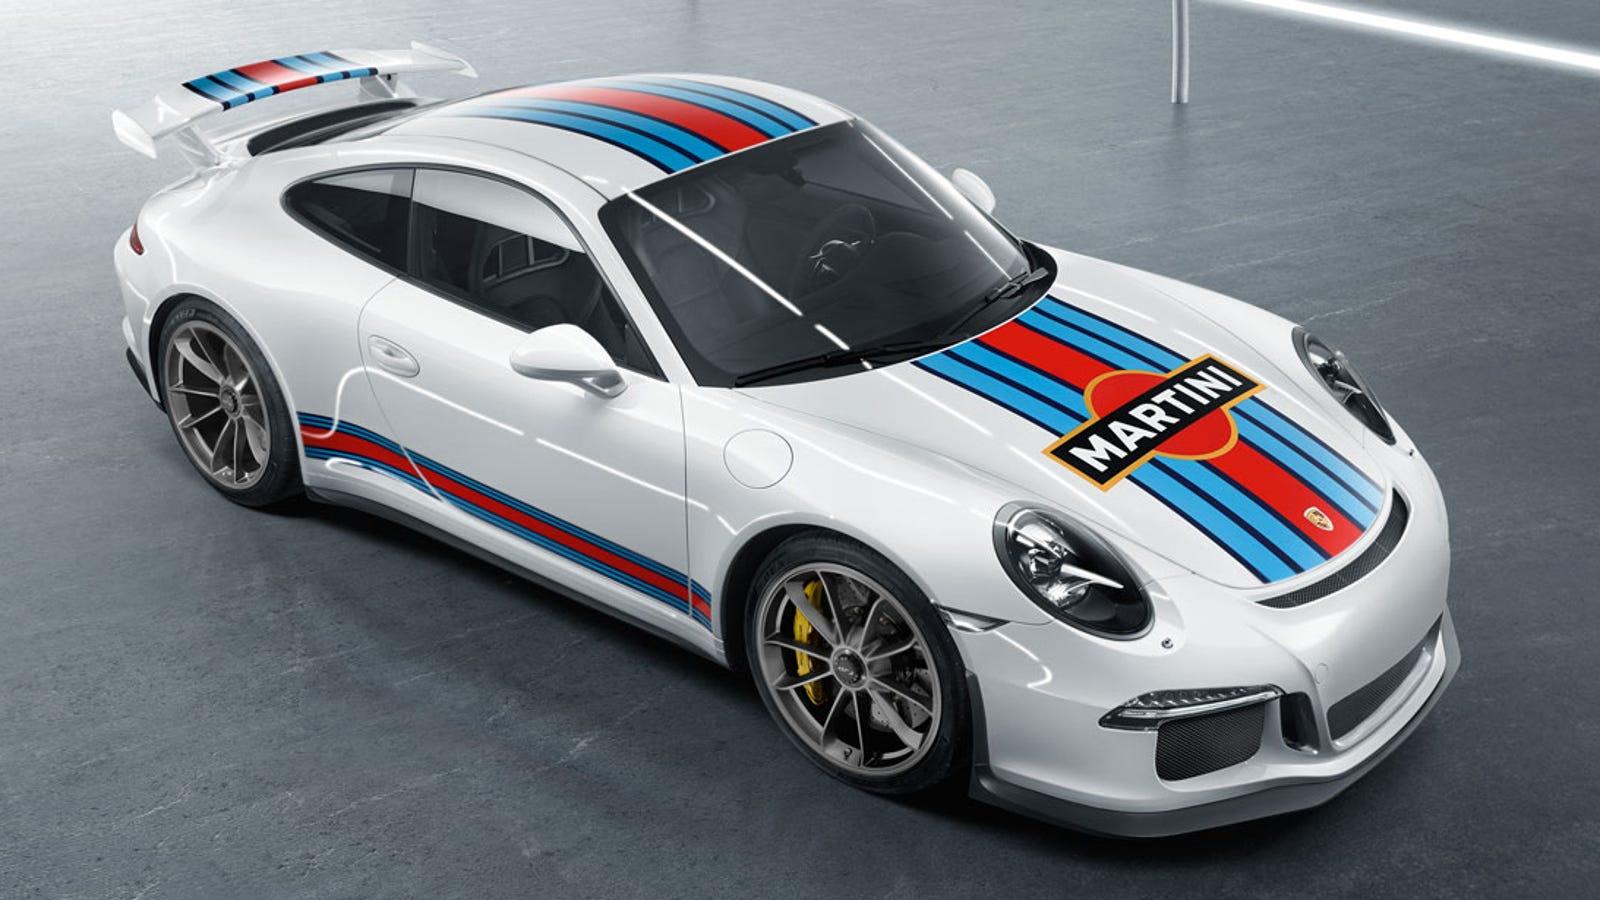 Porsche Martini Racing Design Decals